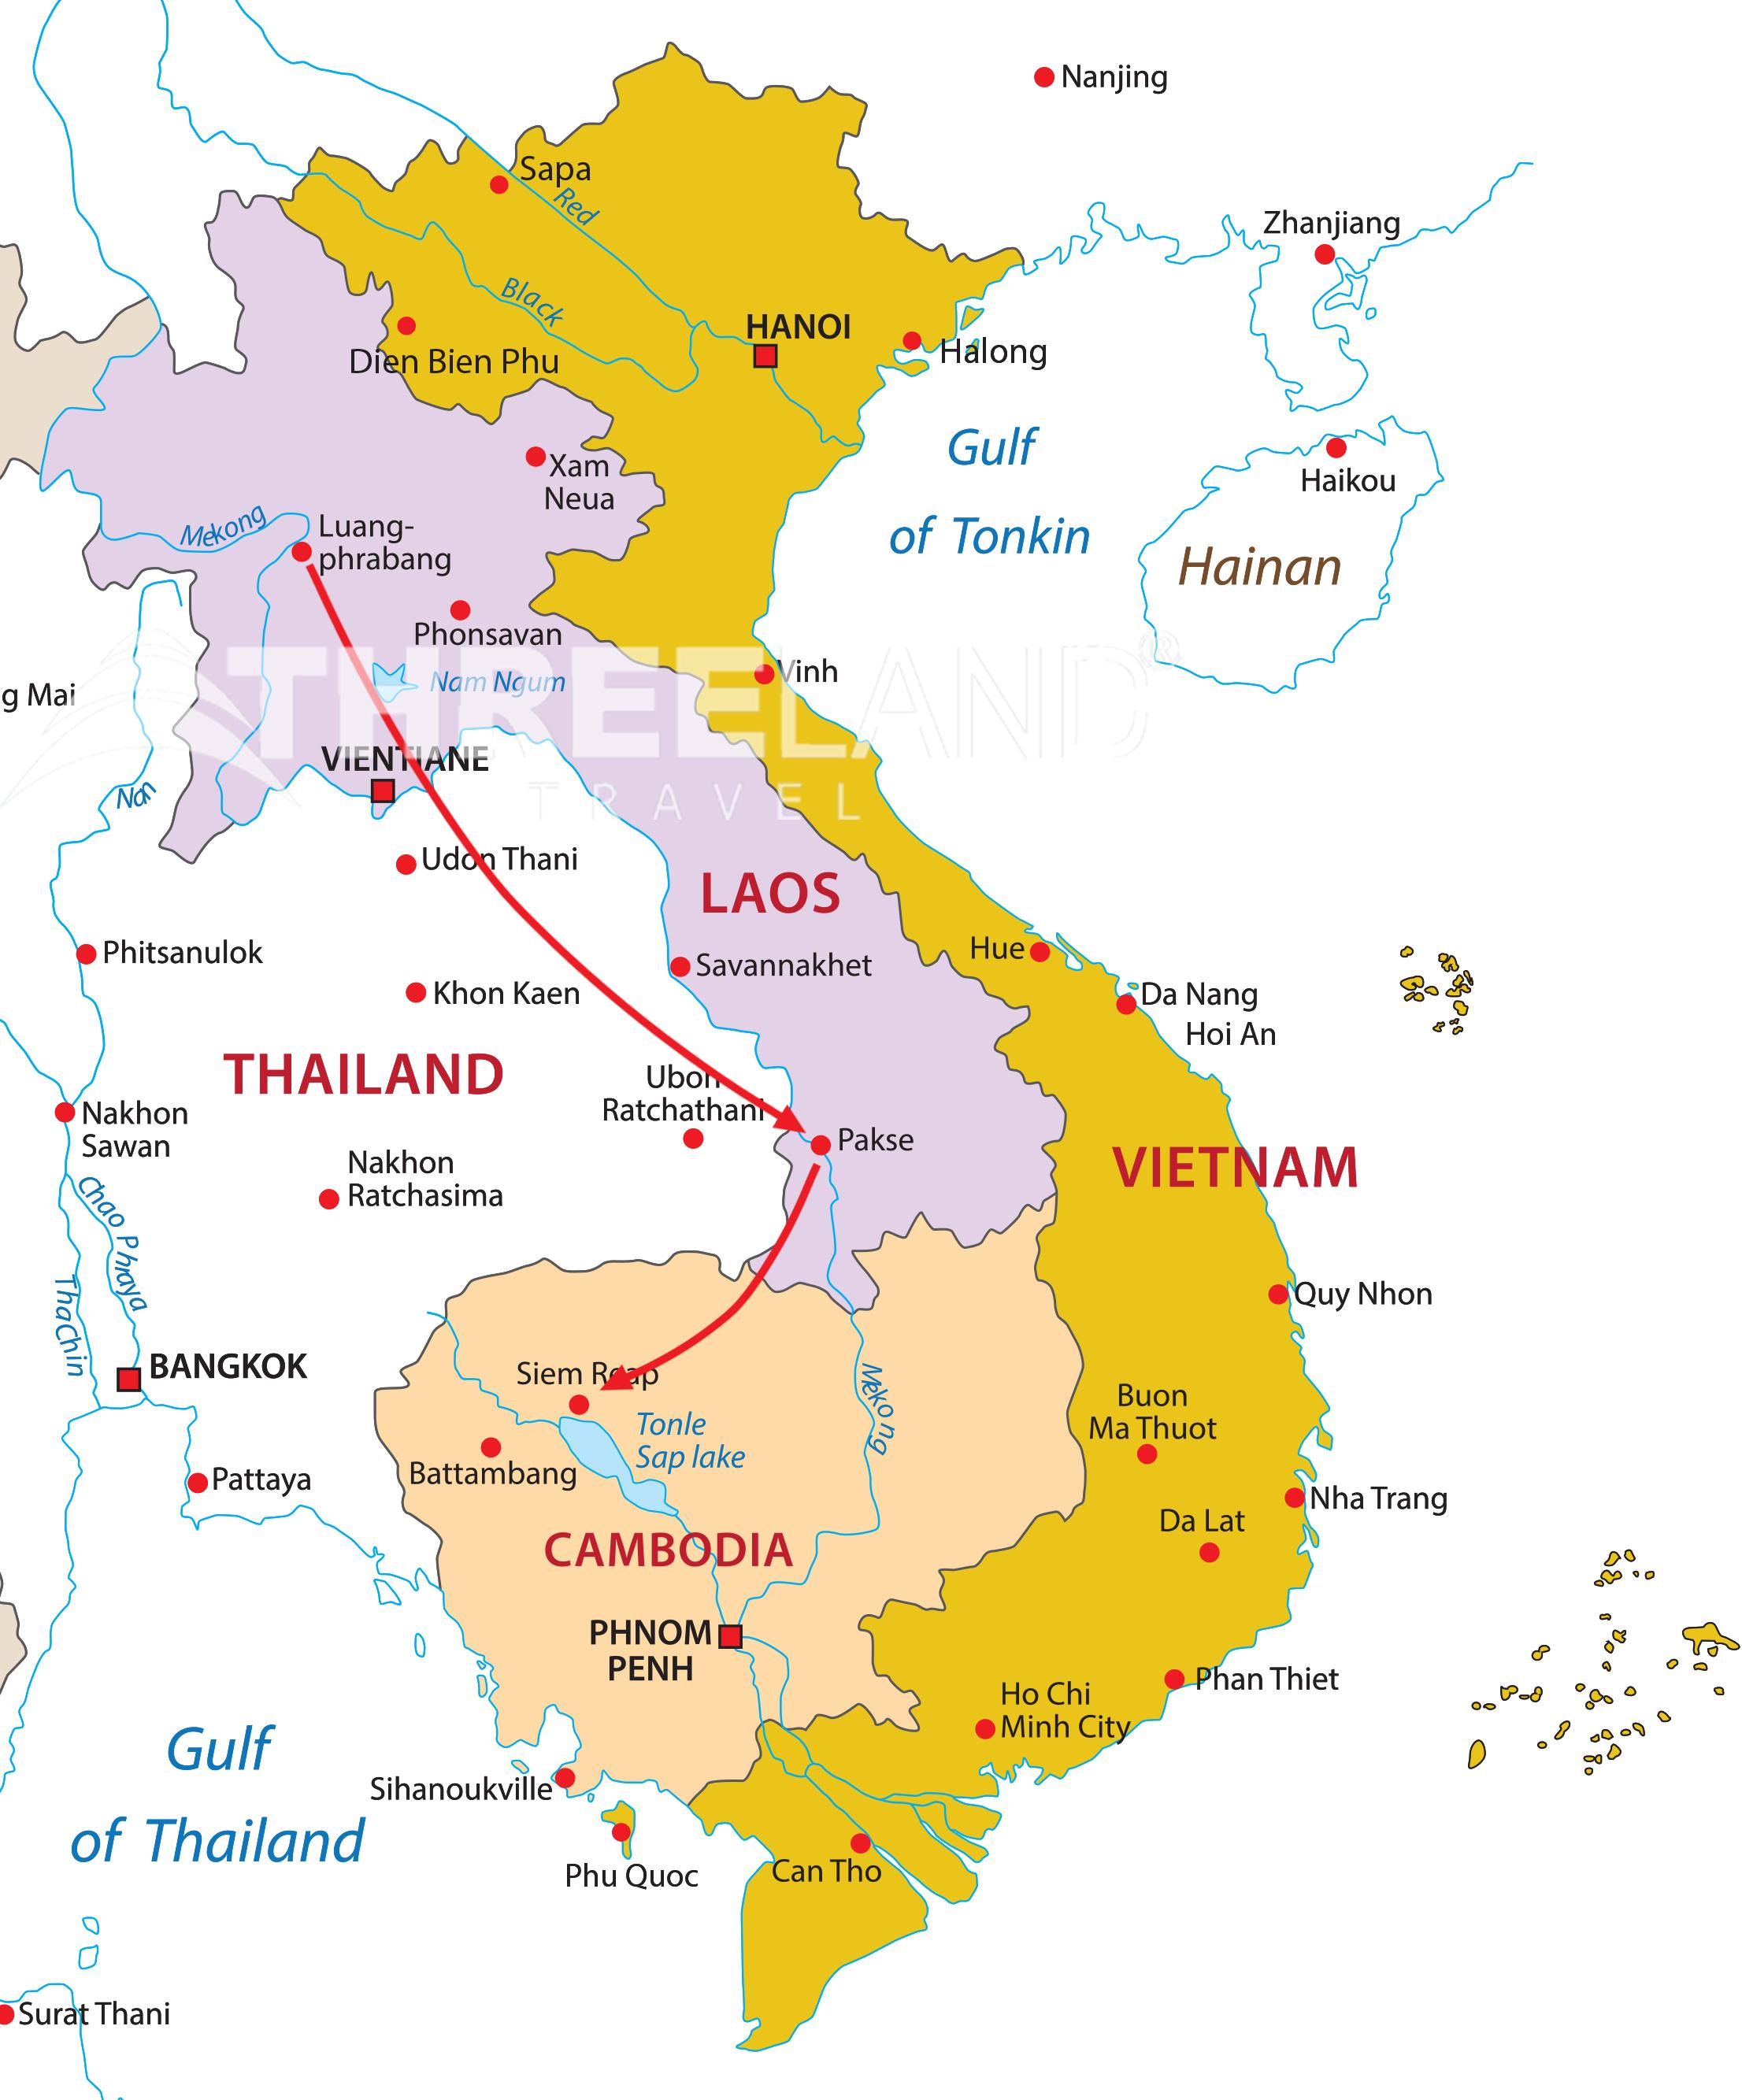 Transborder tour Laos - Cambodia